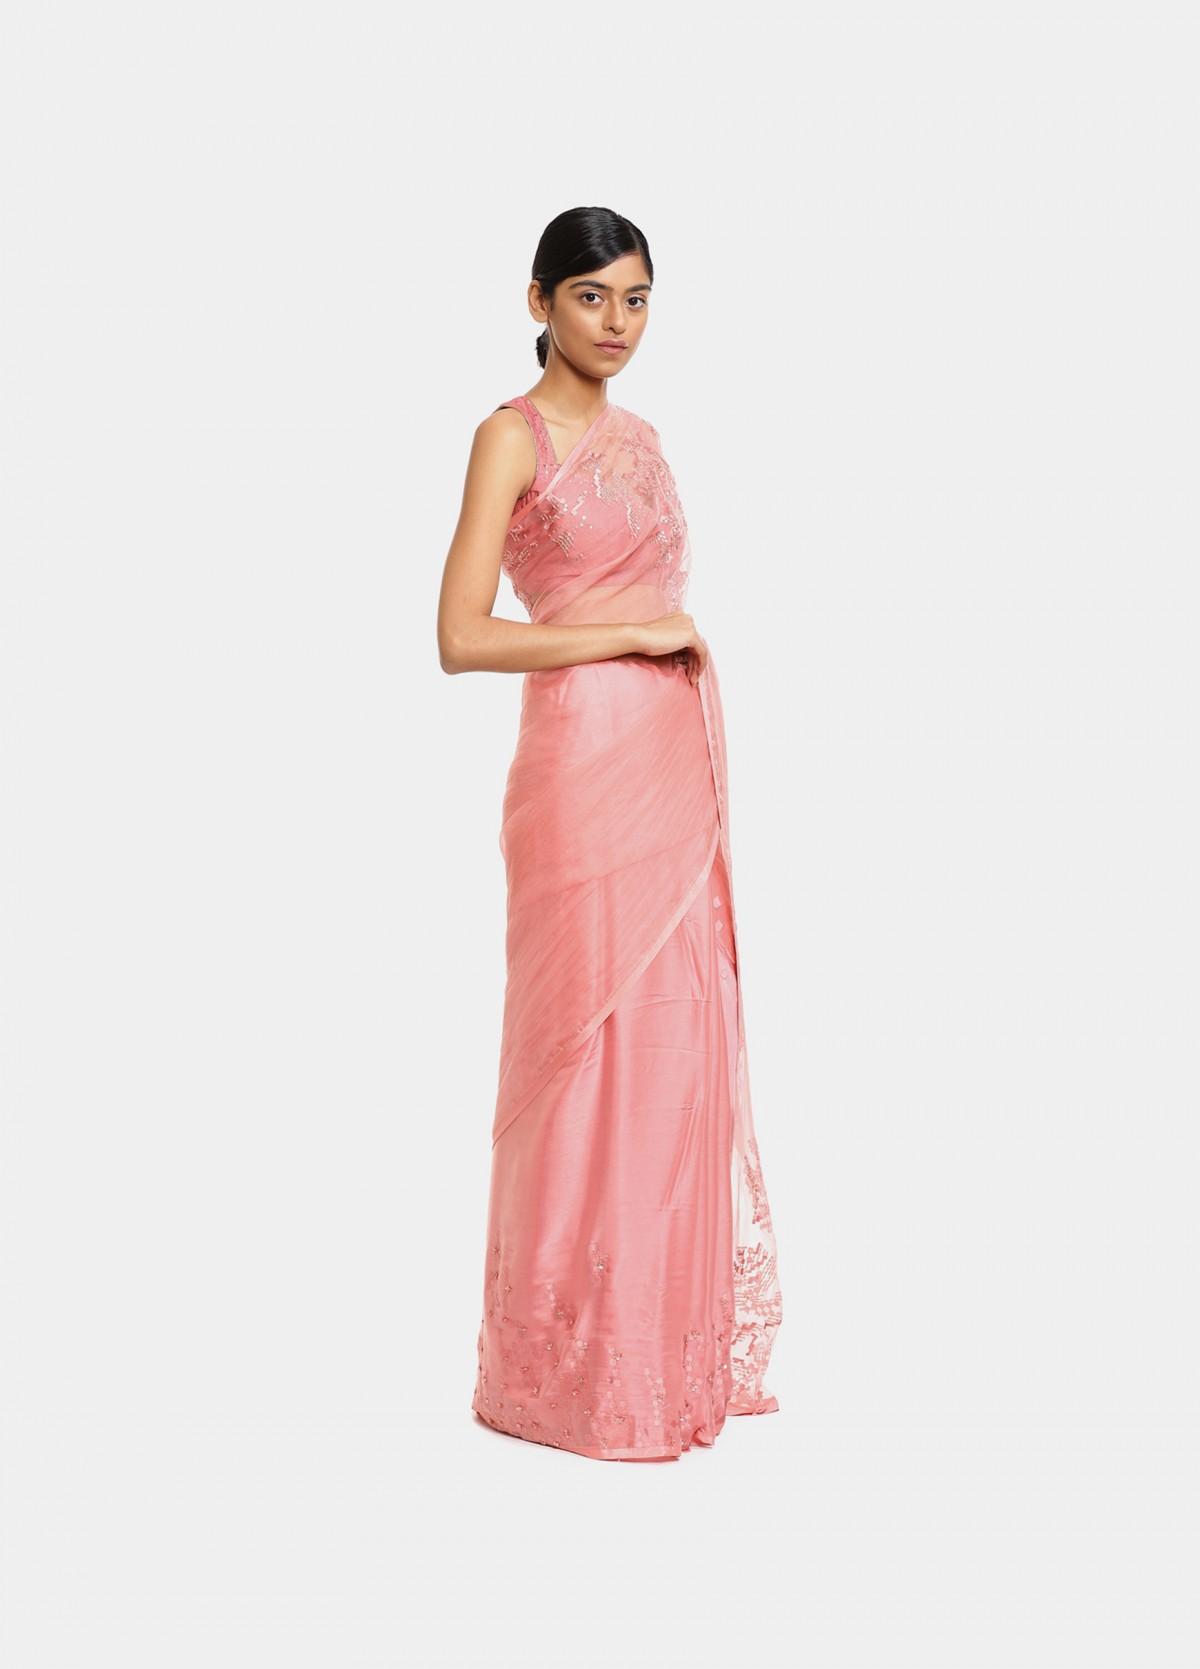 The Graphic Bud Sari